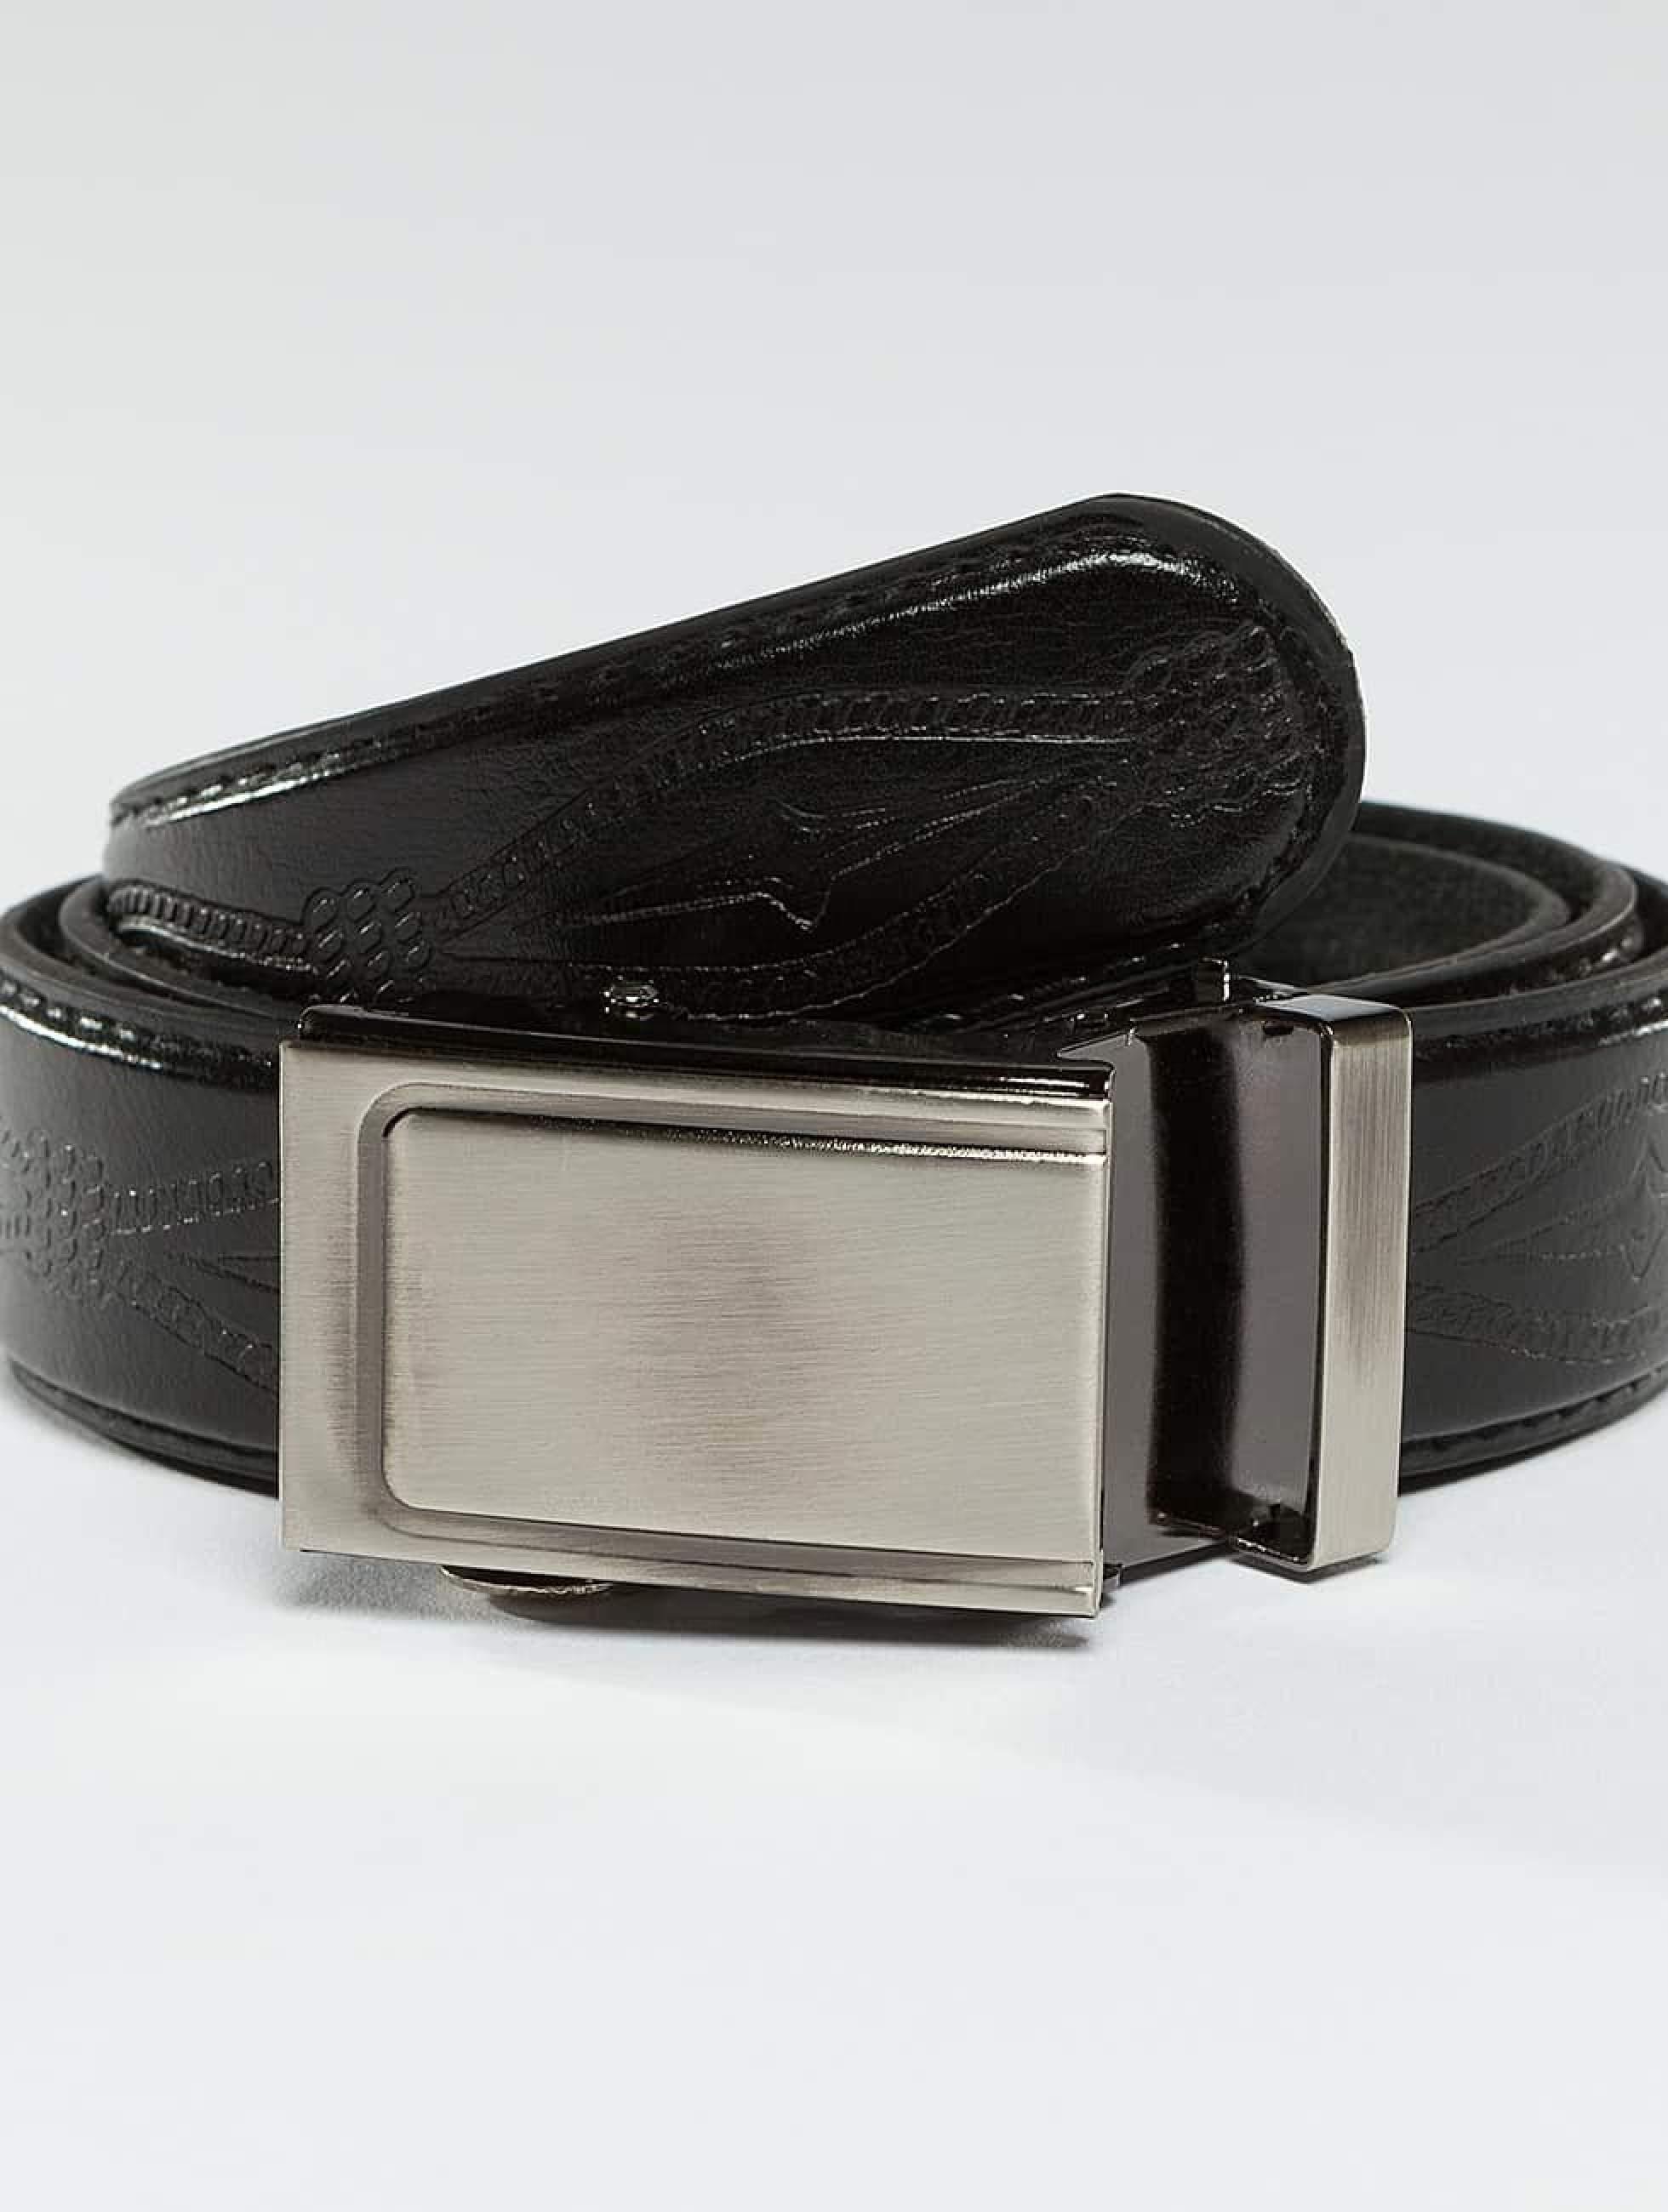 Kaiser Jewelry | Leather Belt noir Homme,Femme Ceinture